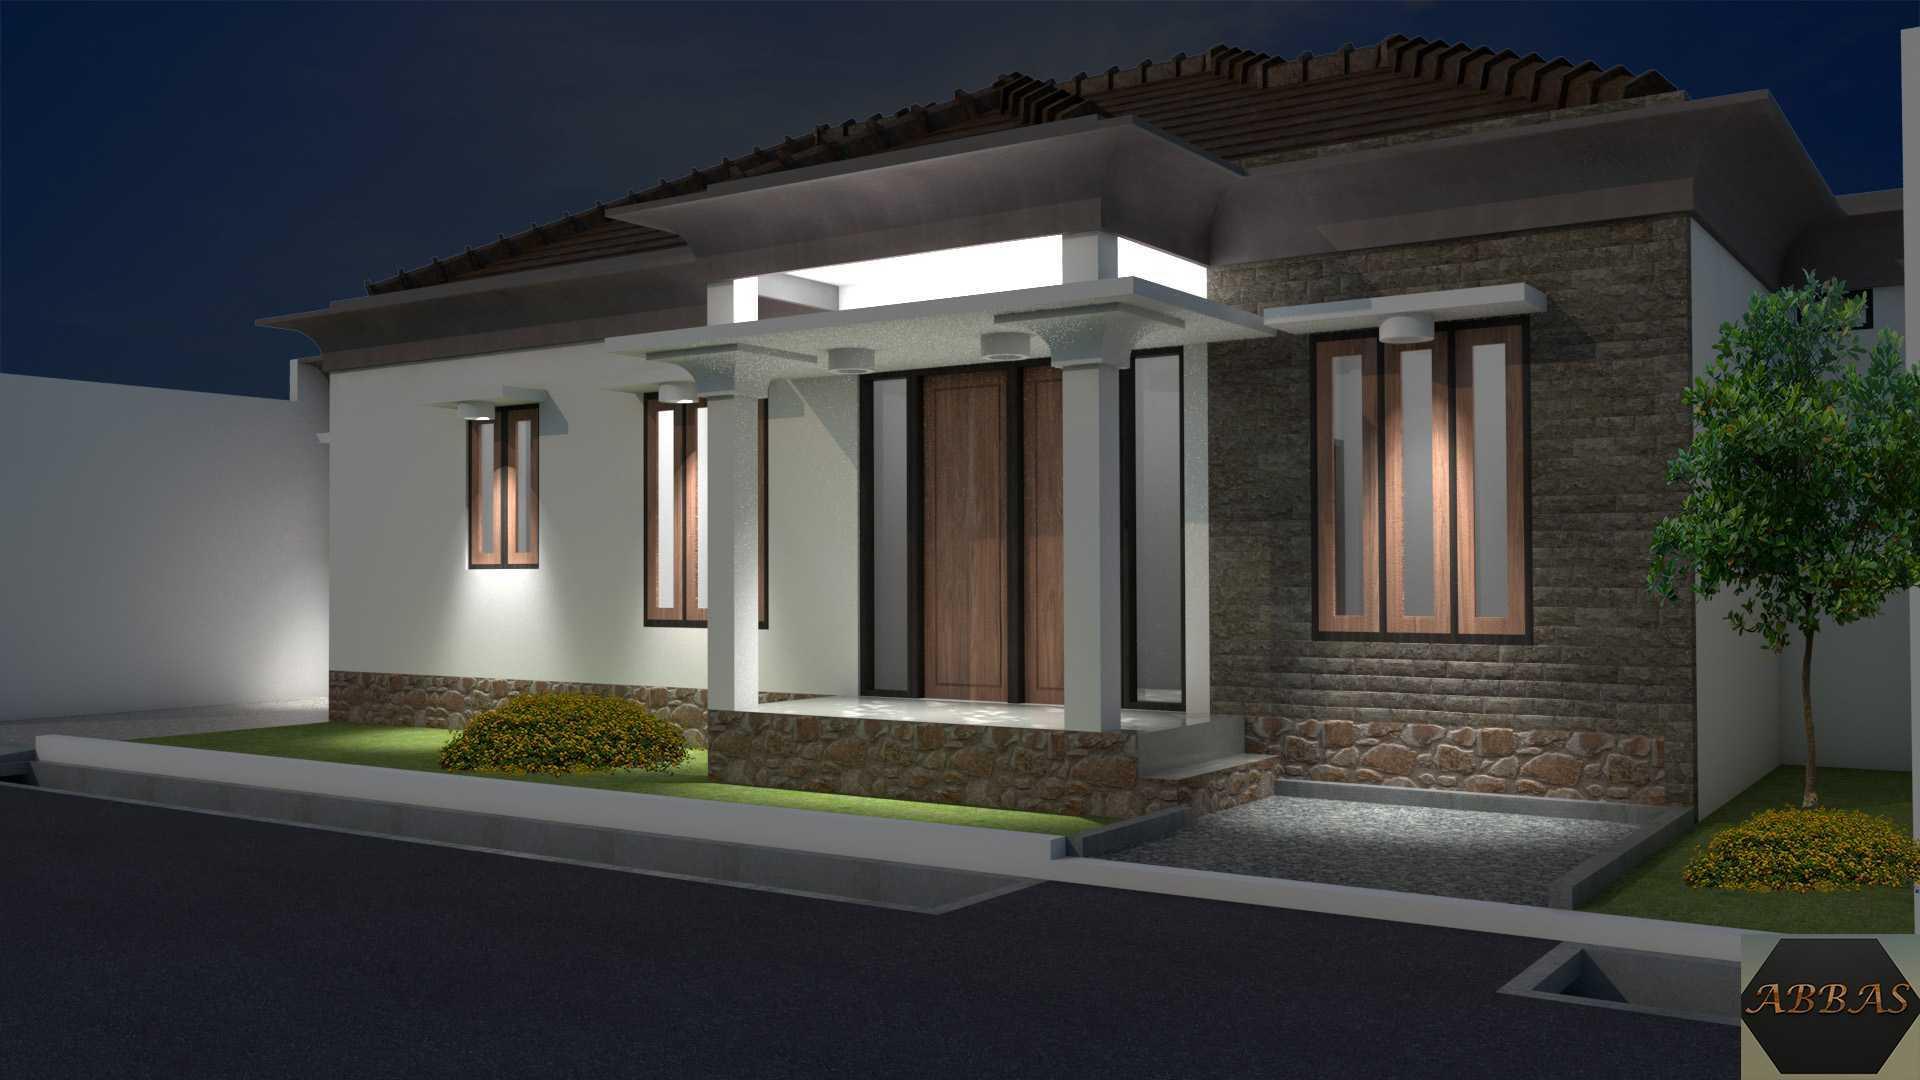 Jasa Arsitek AbbasDC di Lampung